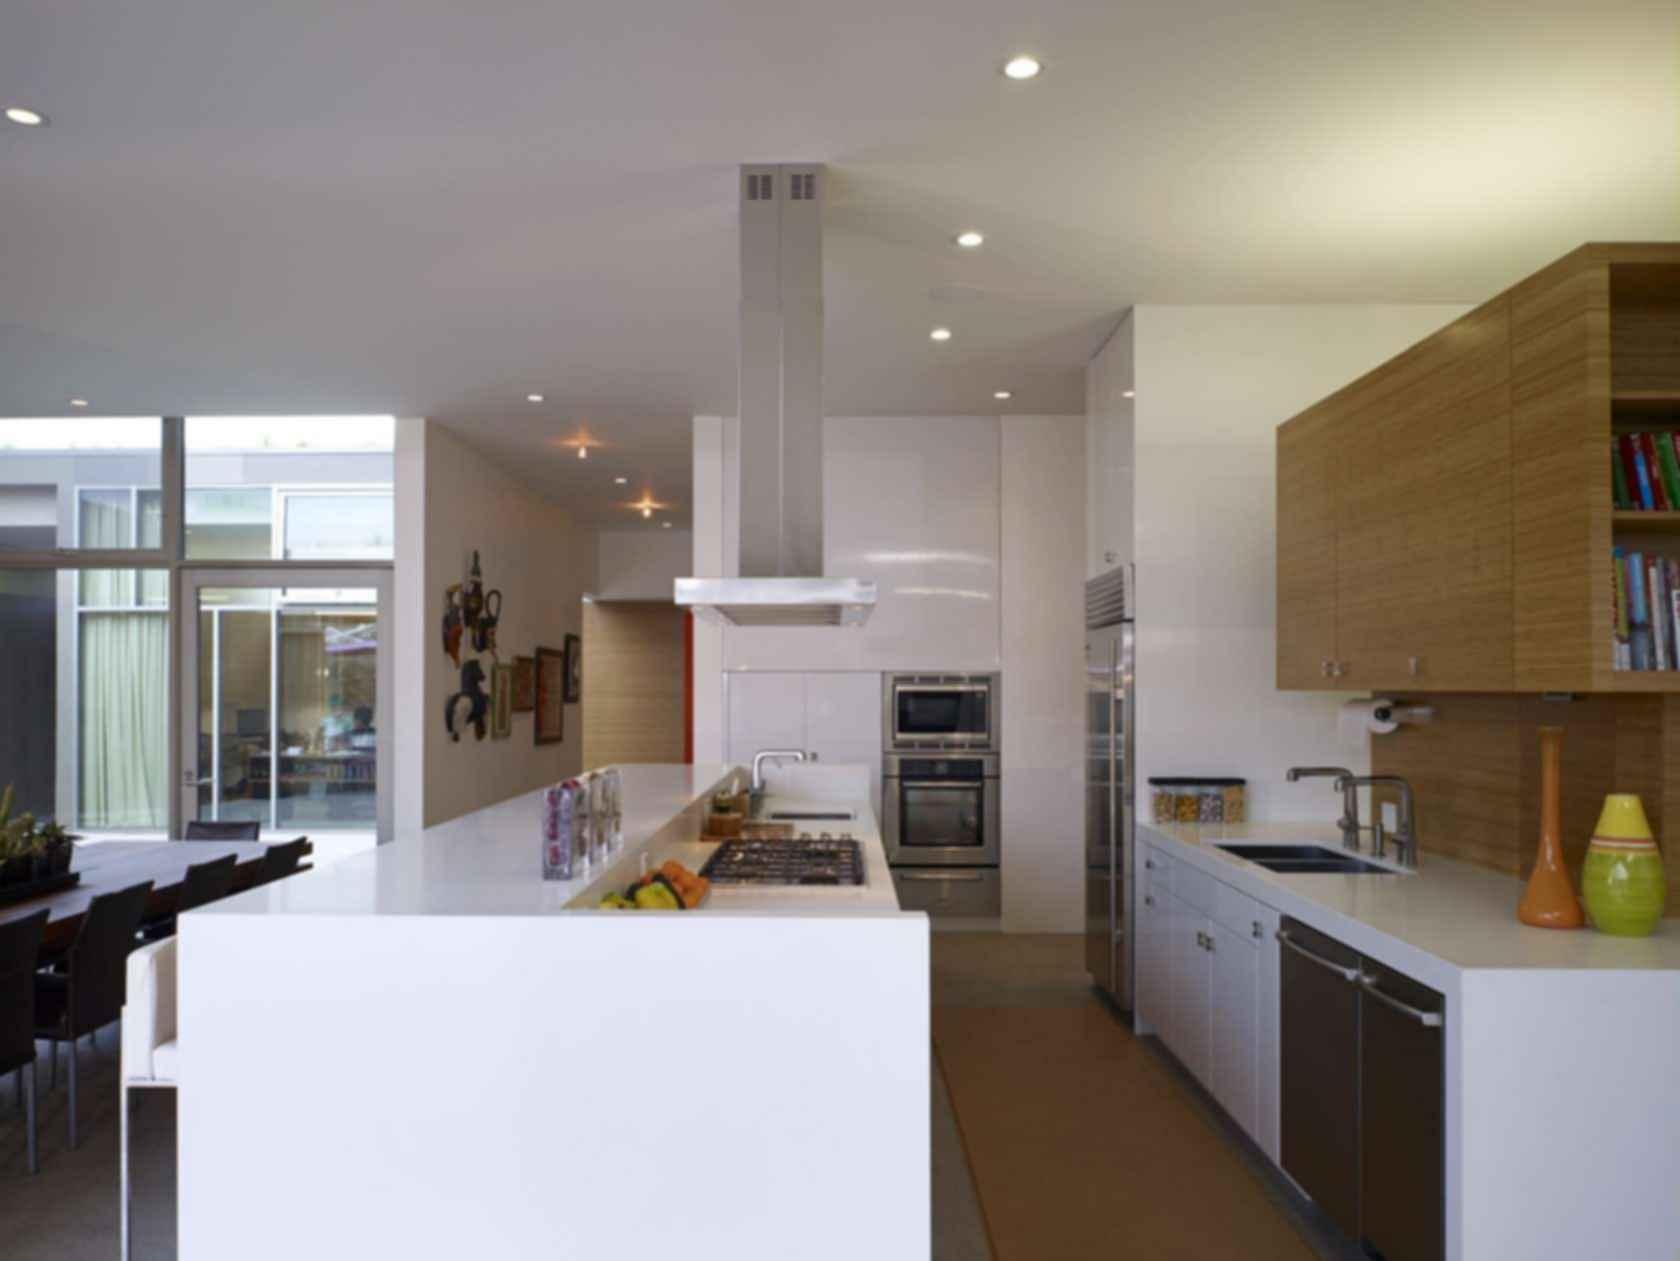 Ying Yang House - Kitchen